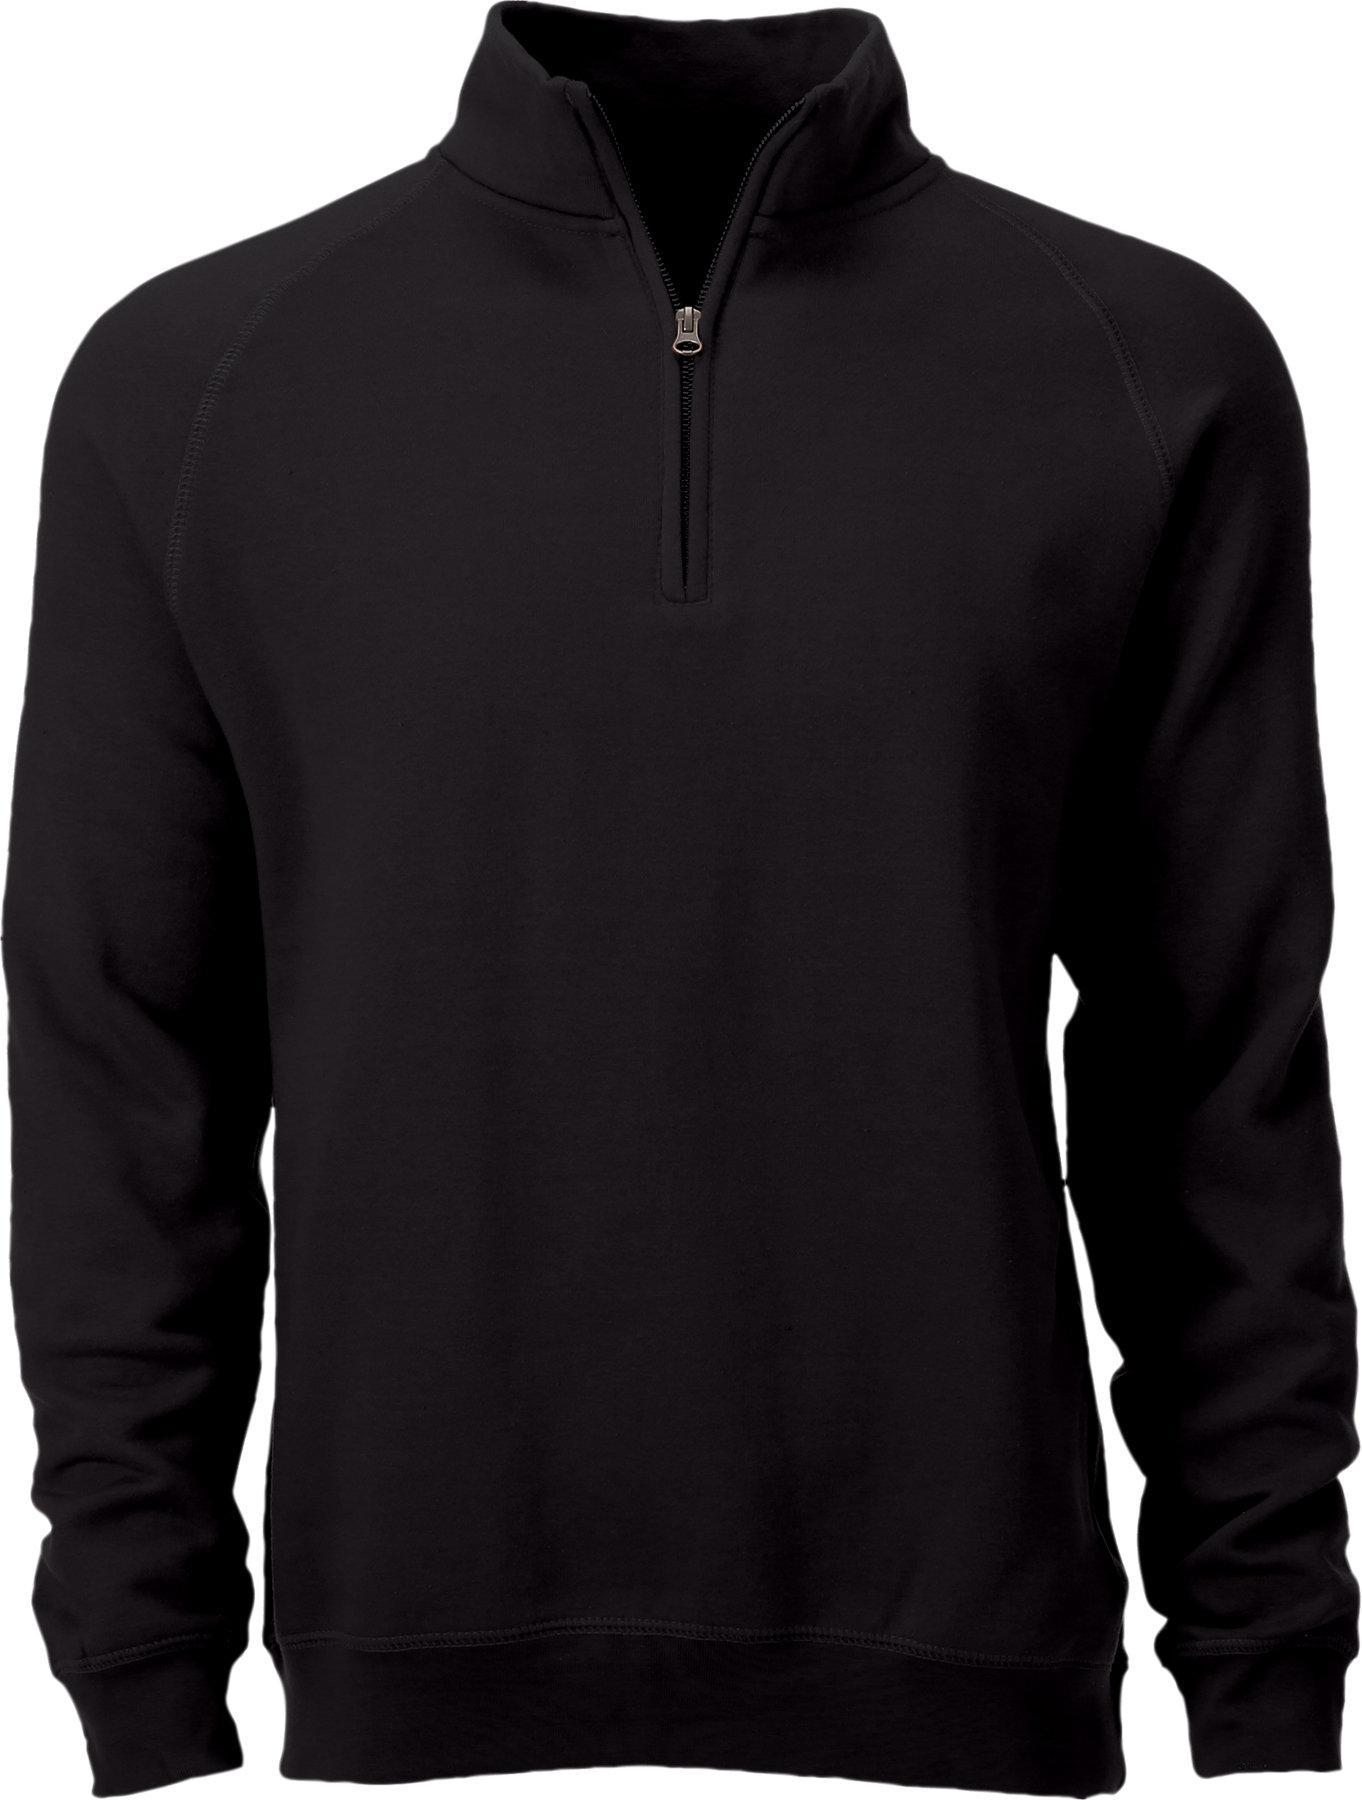 Ouray Sportswear mens Evolution 1//4 Zip